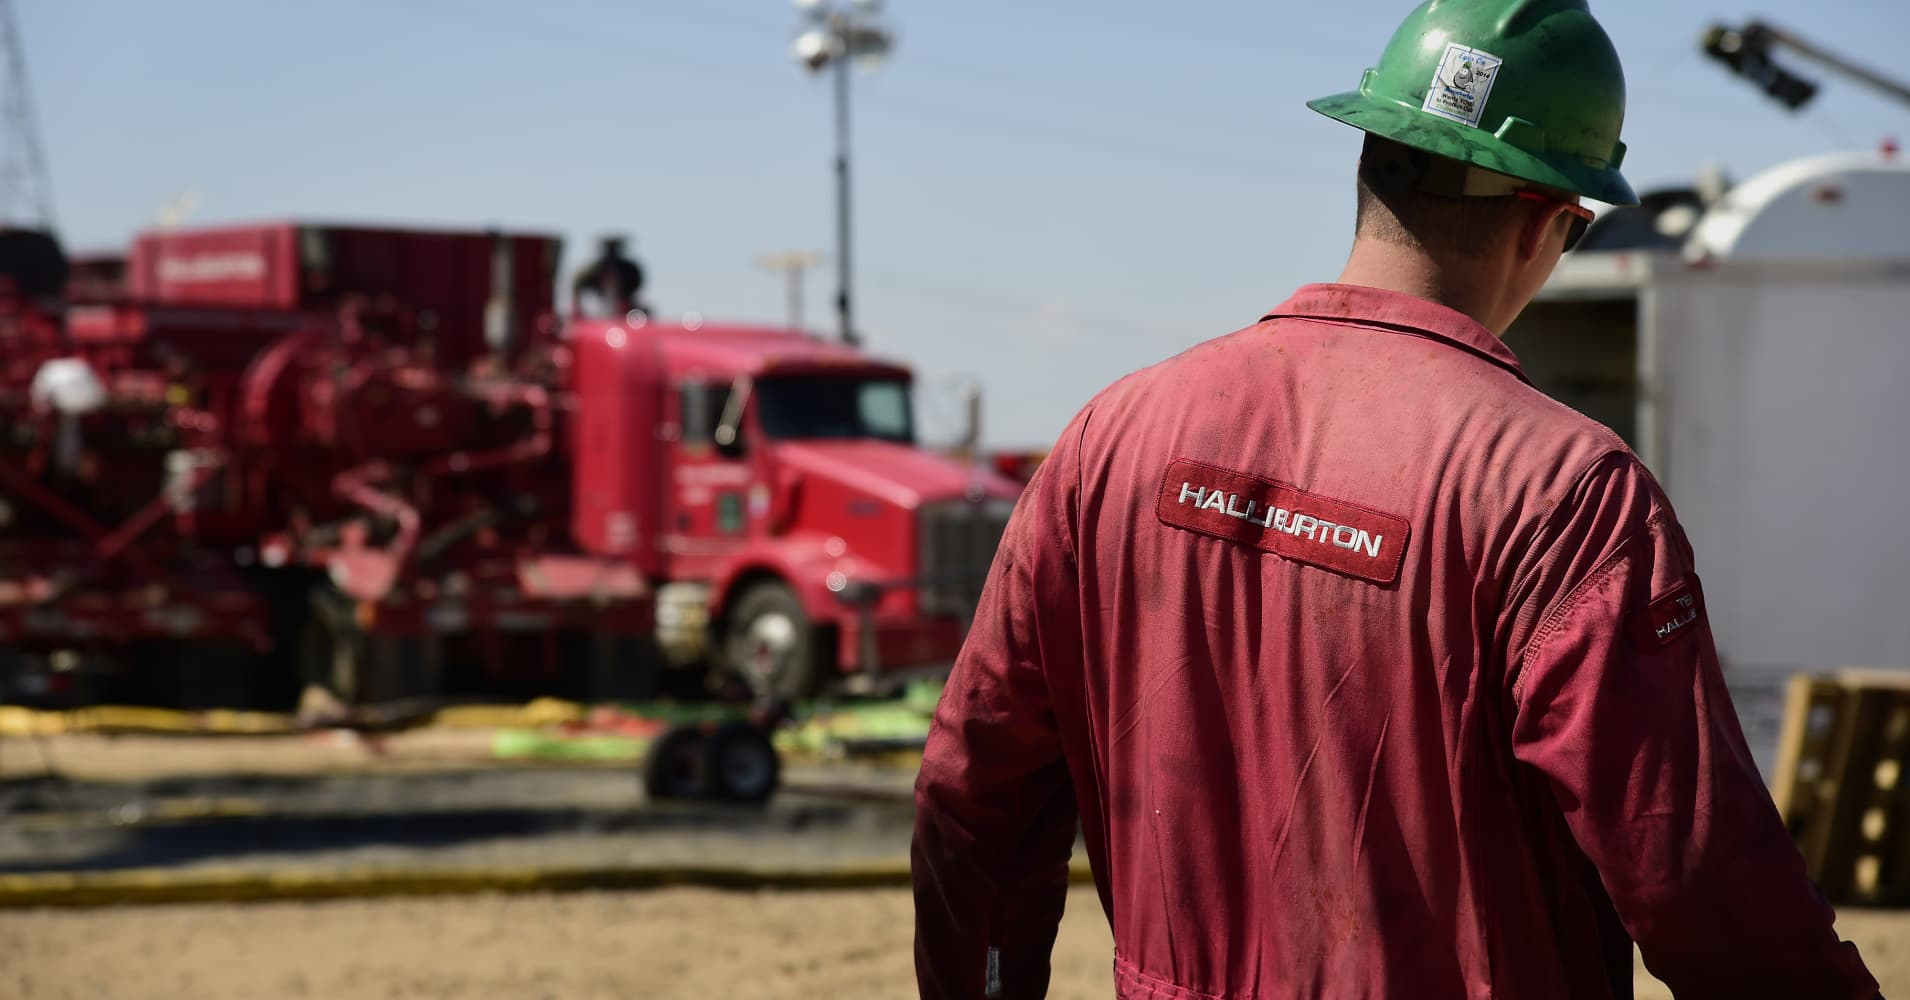 Halliburton revenue beats estimates on higher North America rig count